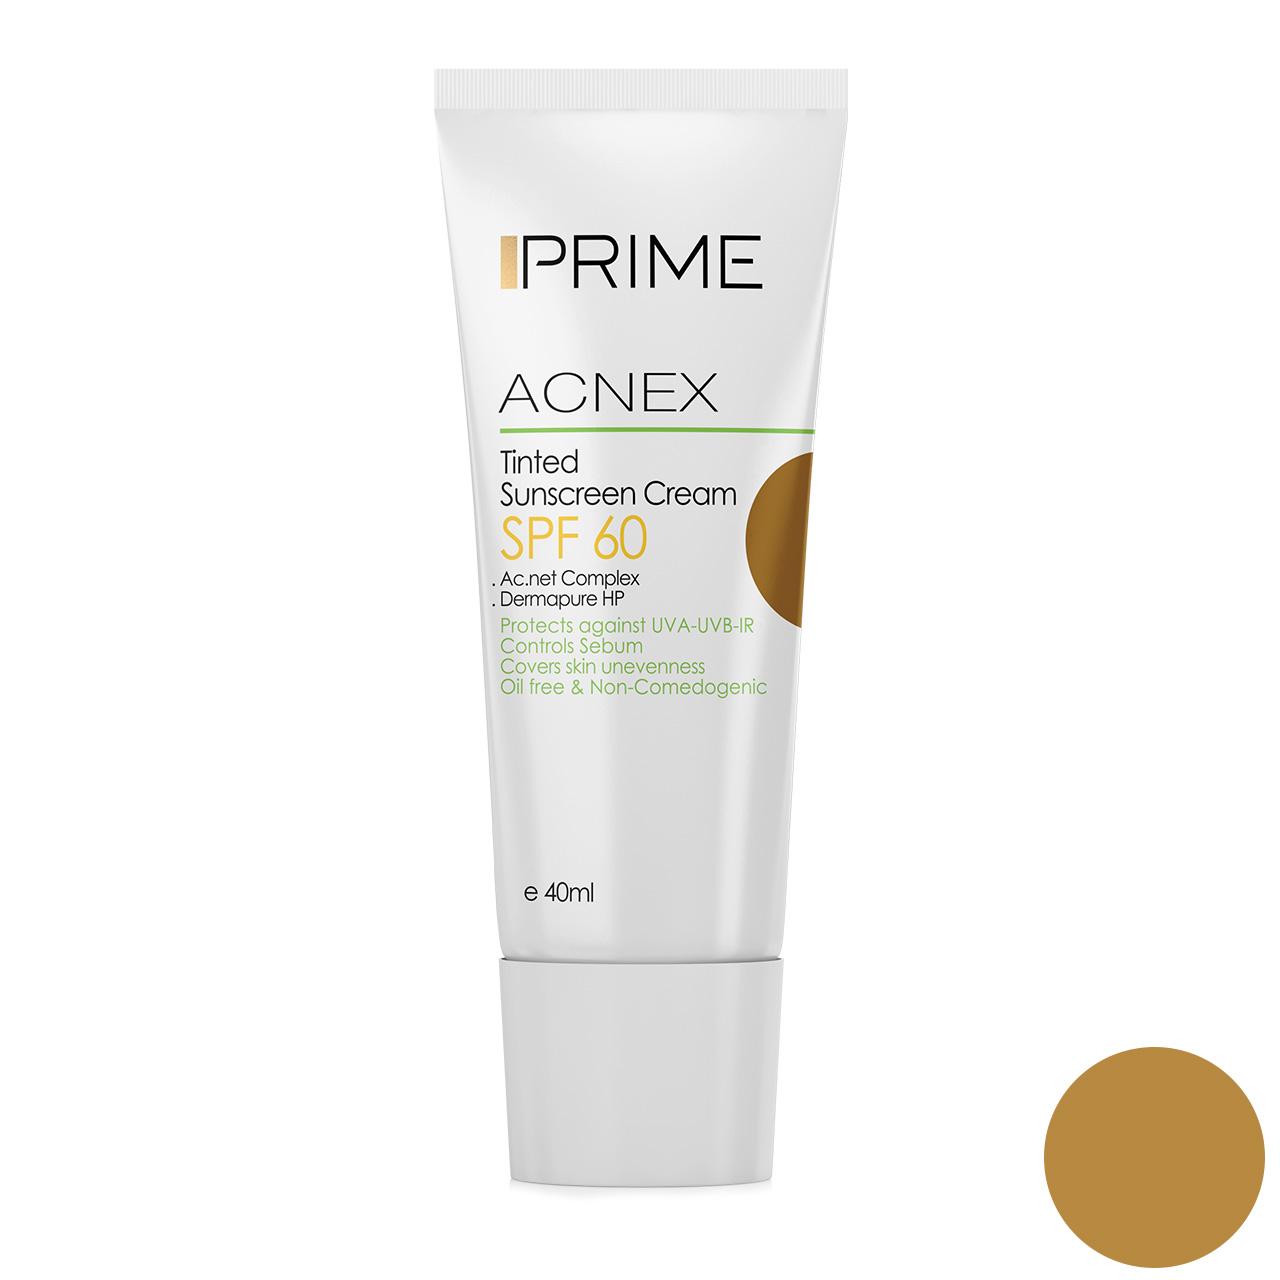 قیمت کرم ضد آفتاب رنگی پریم سری Acnex مدل Dark حجم 40 میلی لیتر